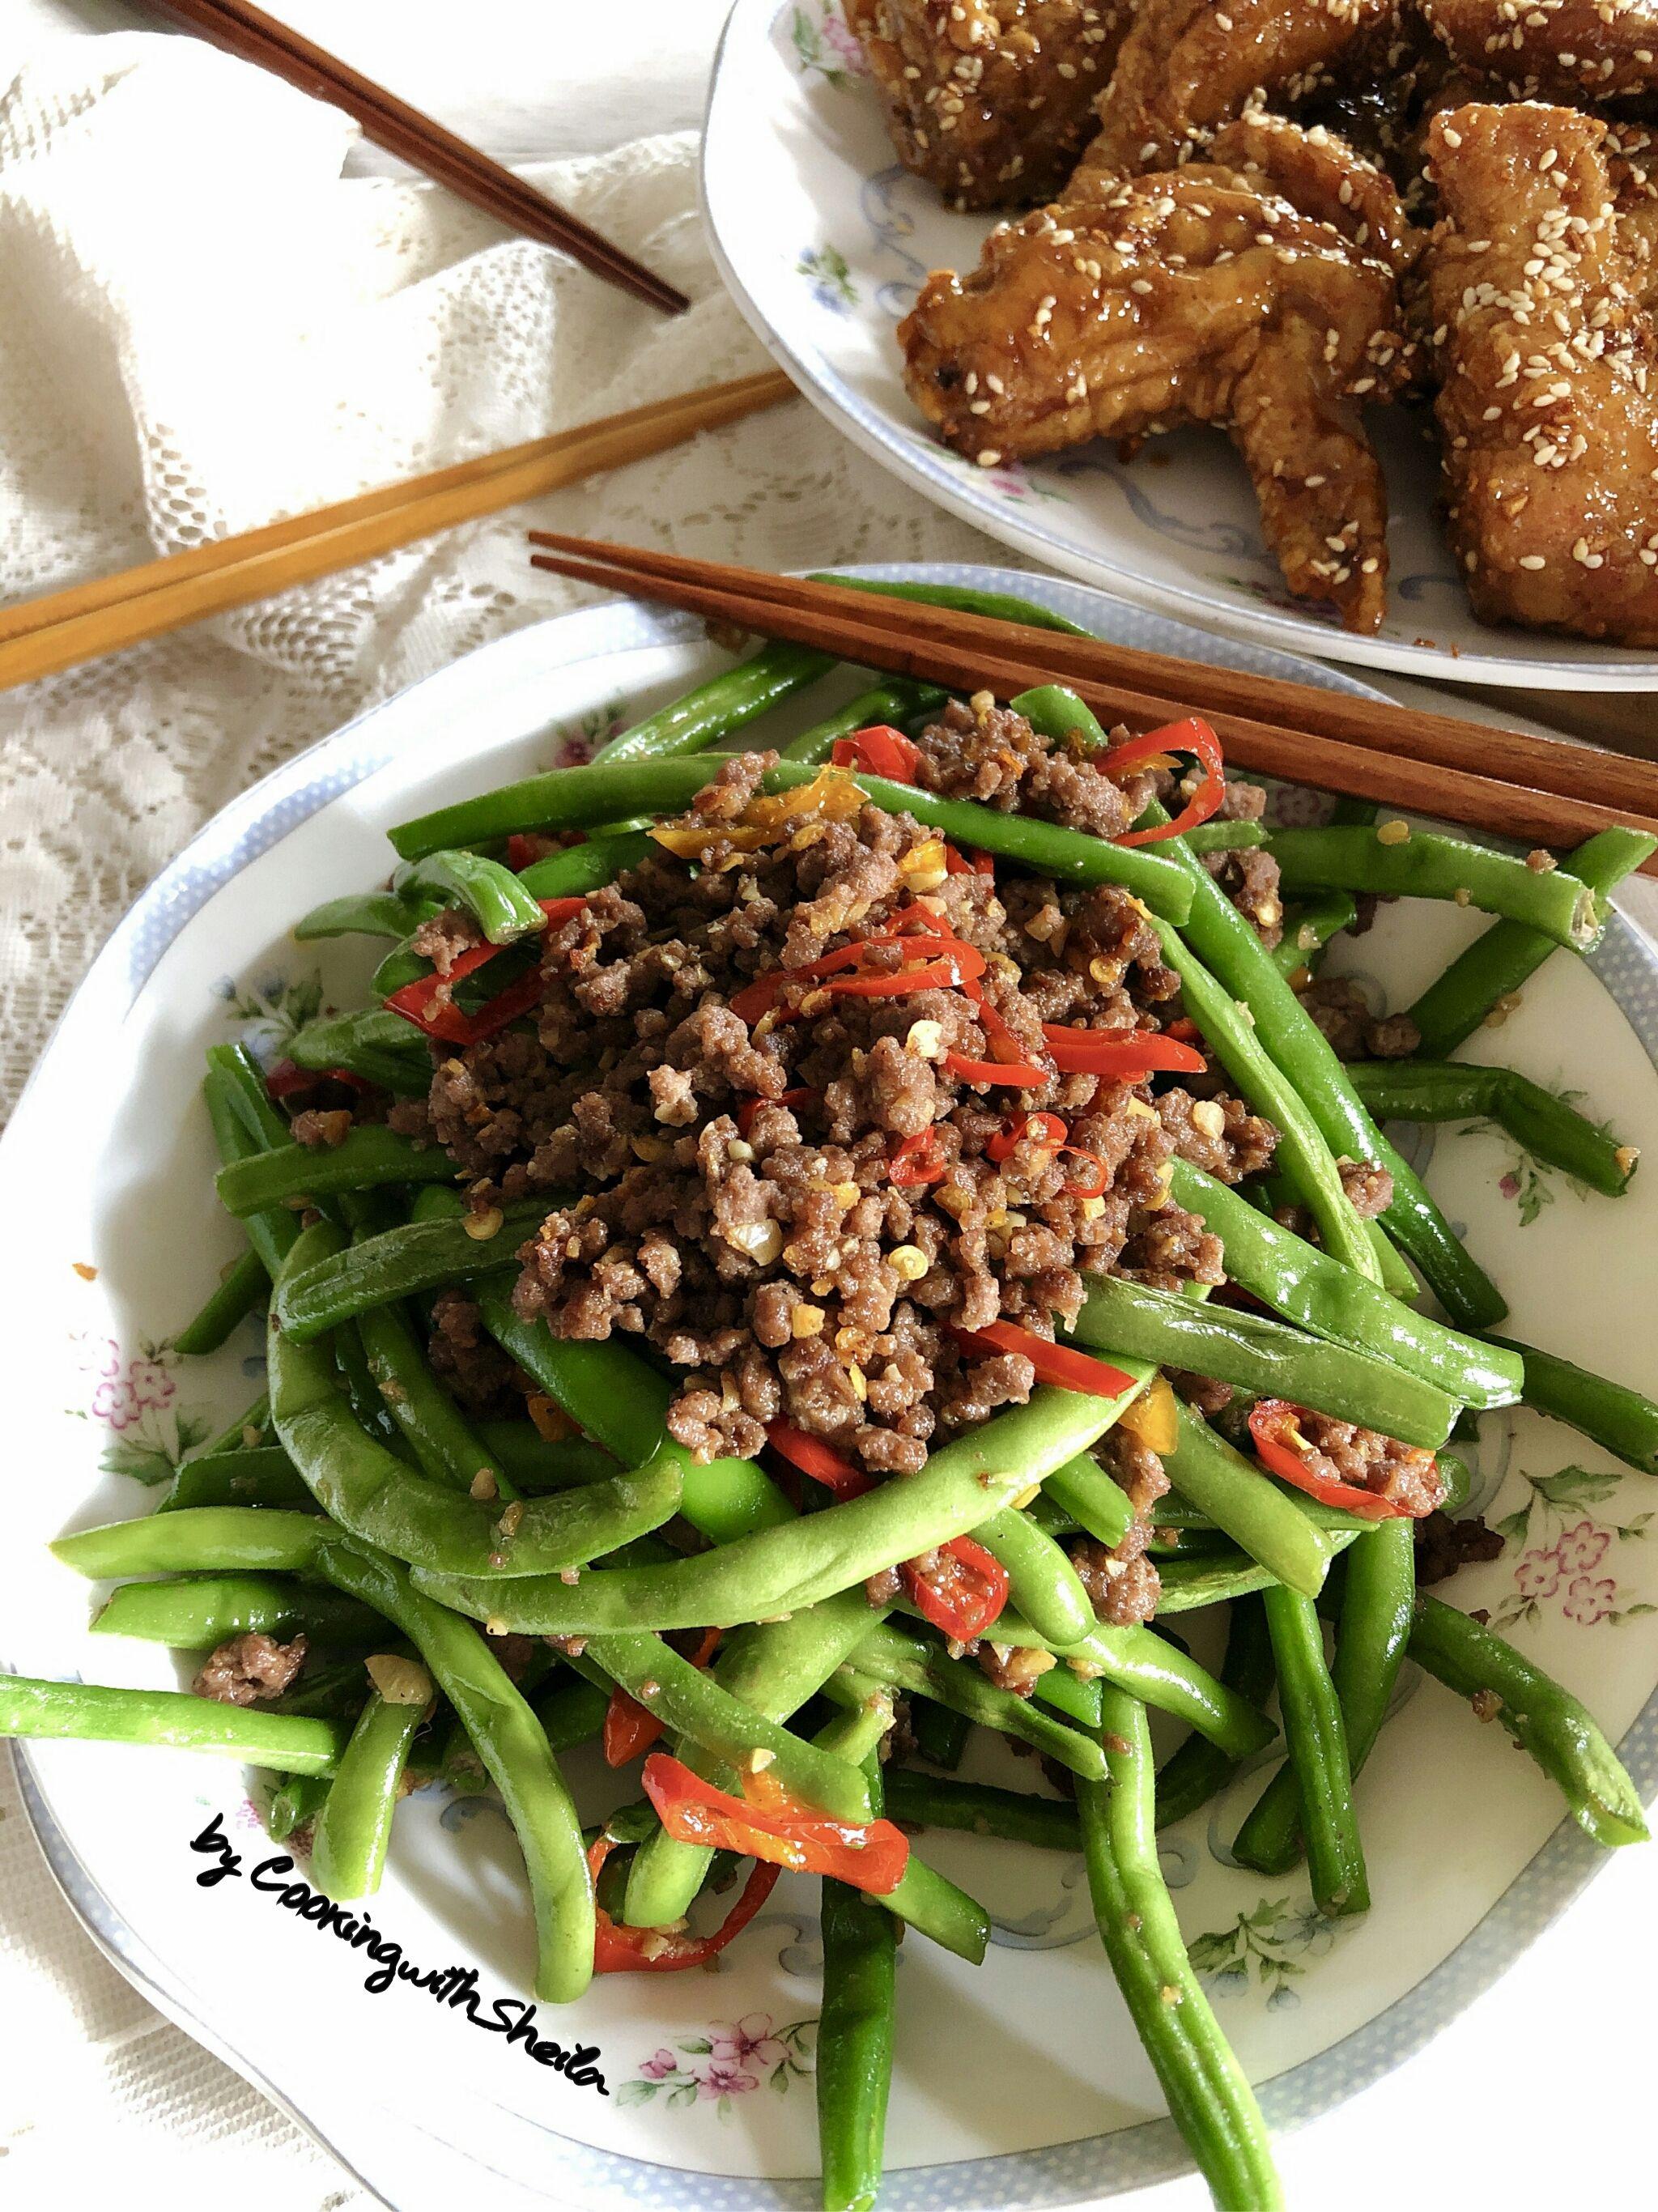 Buncis Masak Szechuan Ini Banyak Banget Dijual Di Resto Resto Chinese Biasanya Buncisnya Digoreng Dulu Enakk Sih Tap Resep Masakan Resep Masakan Asia Makanan